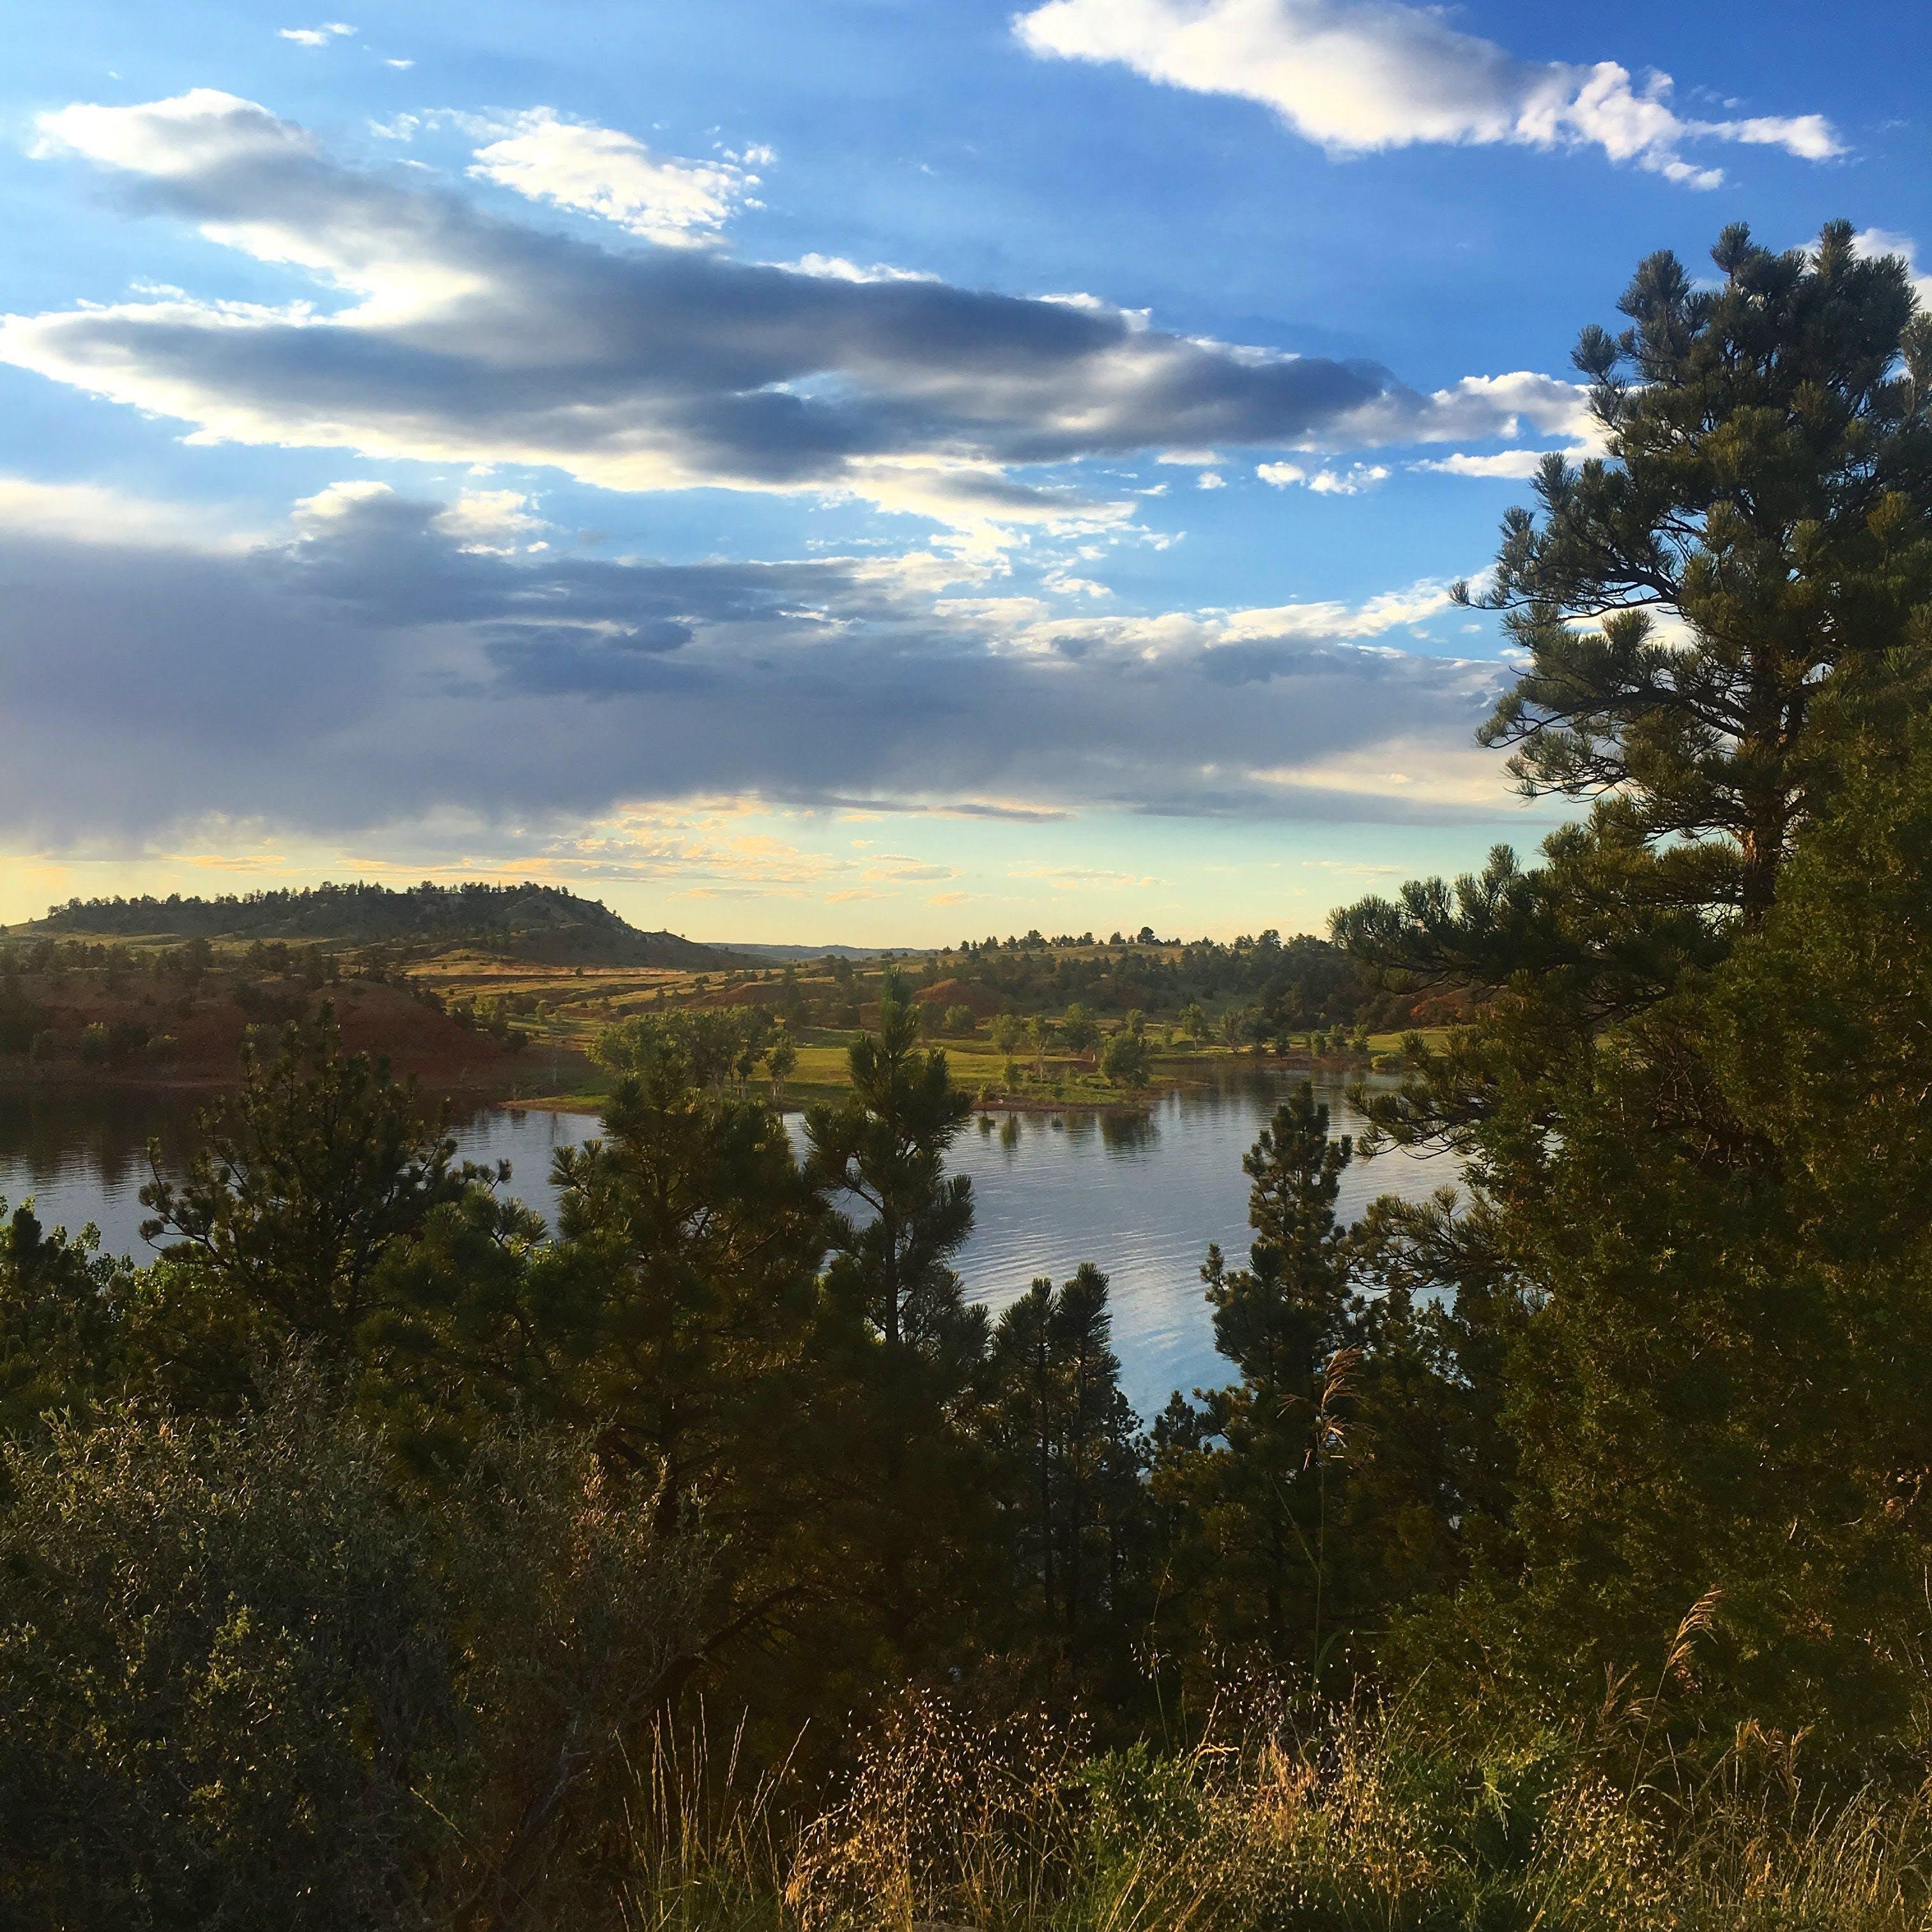 glendo state park, wyoming